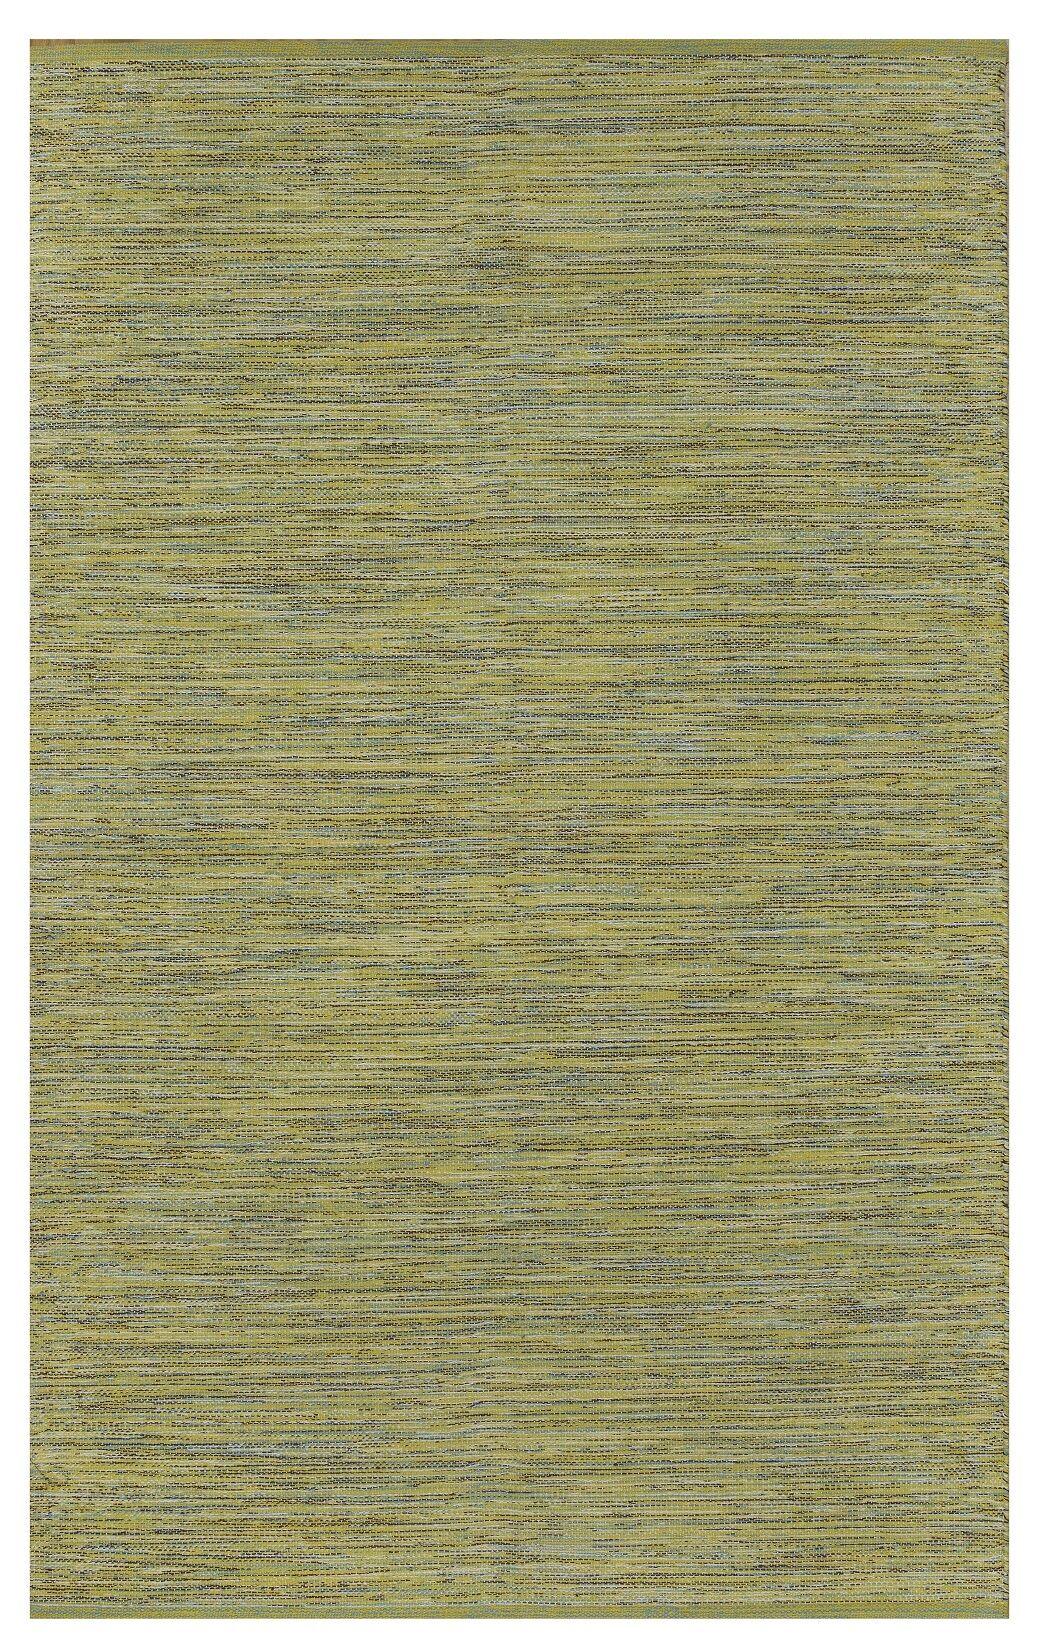 Zen Cancun Lemon/Apple Green Area Rug Rug Size: 8' x 10'